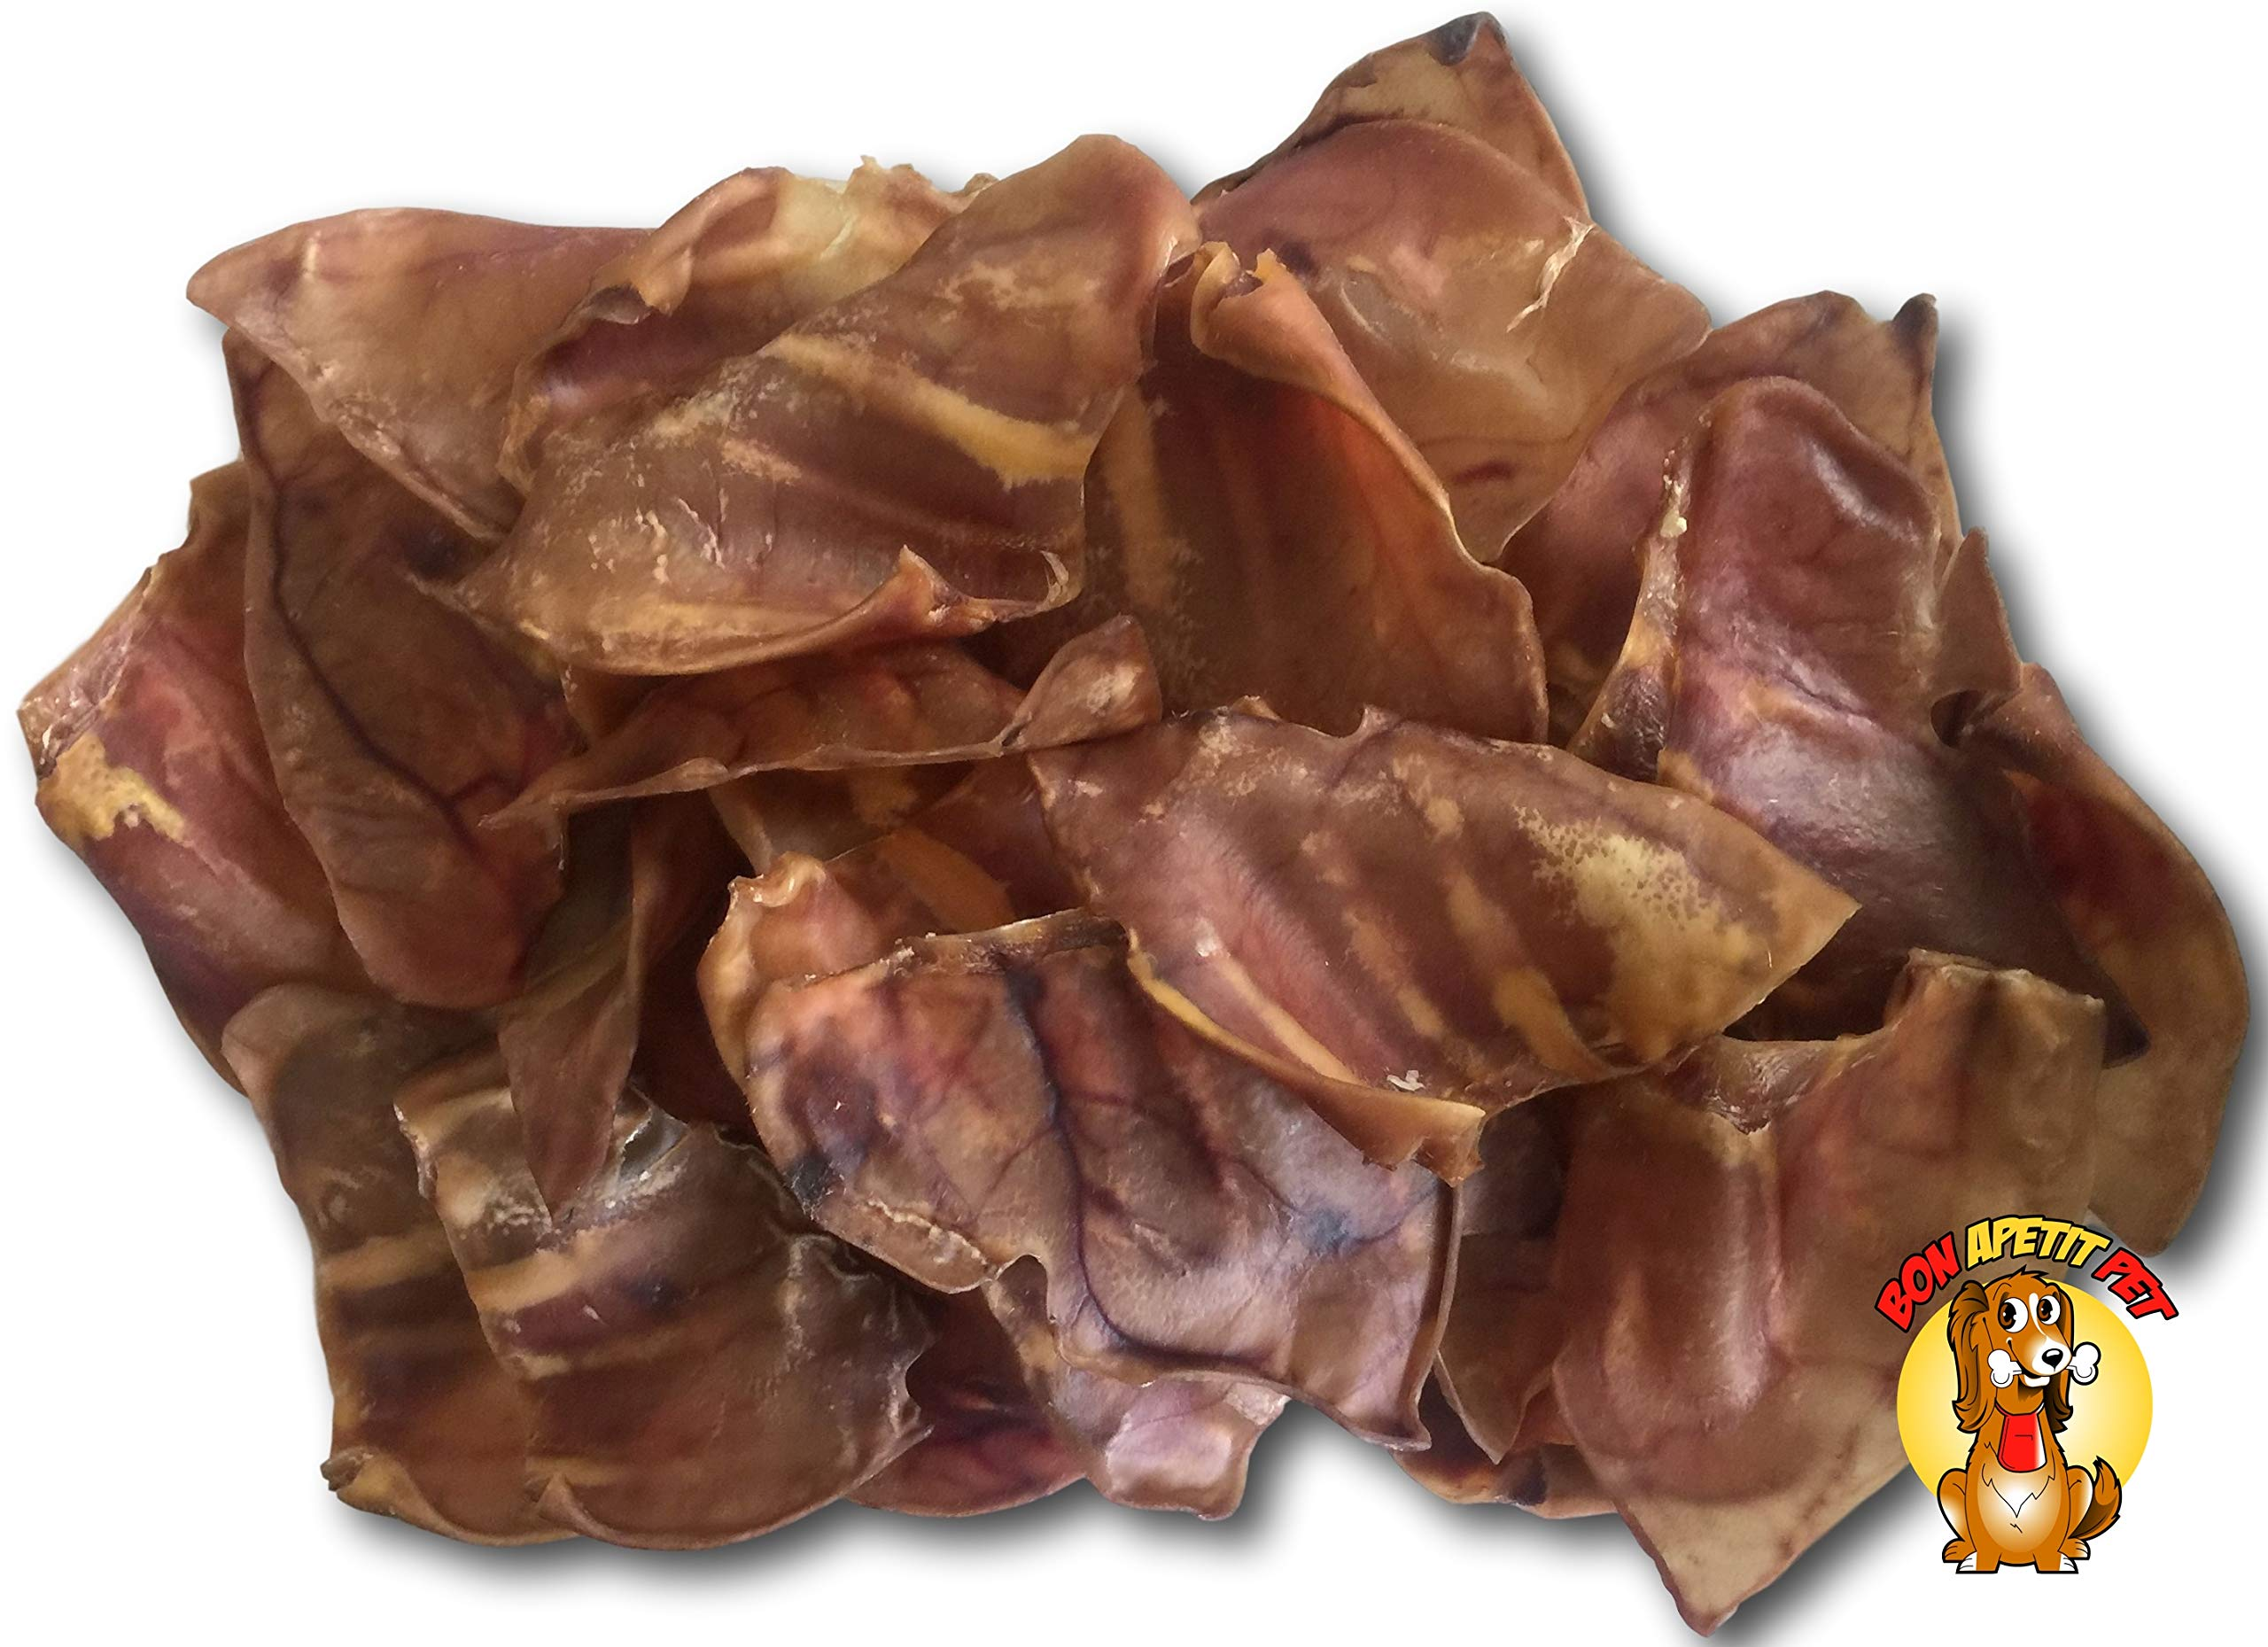 Bon Apetit Pig Ears Dog Chews - 100 Count/Box